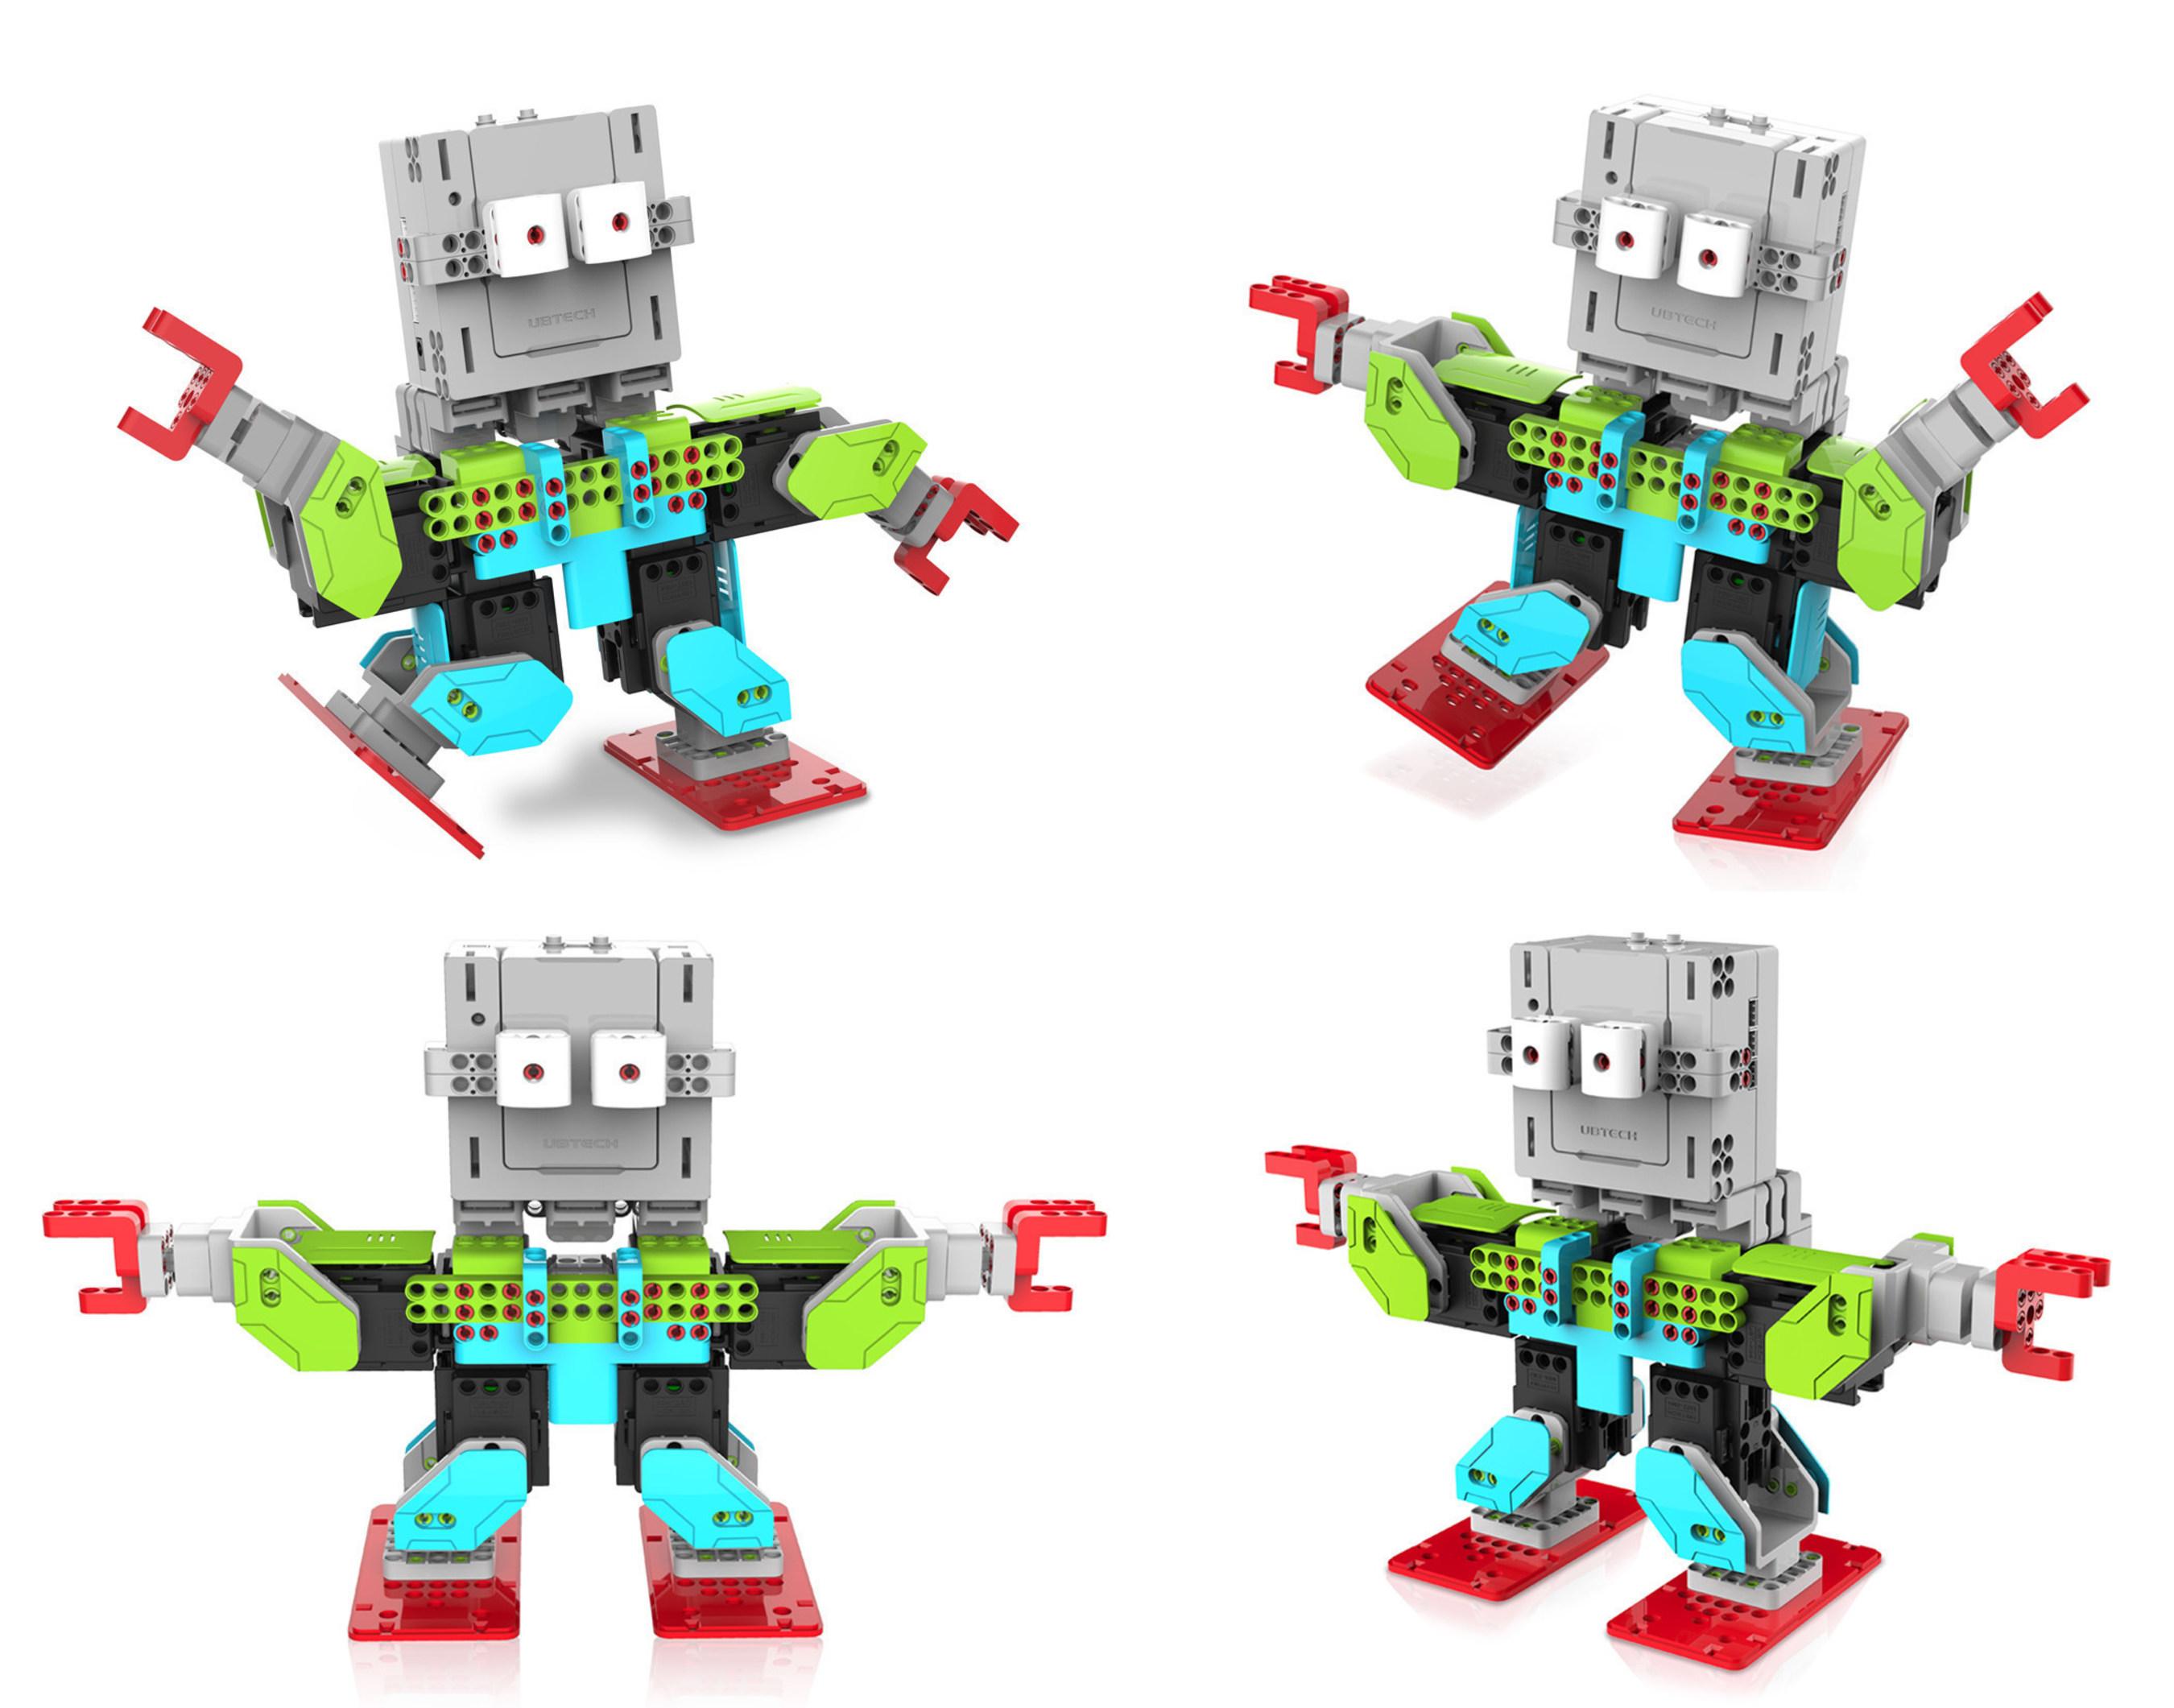 JIMU Robot - MeeBot